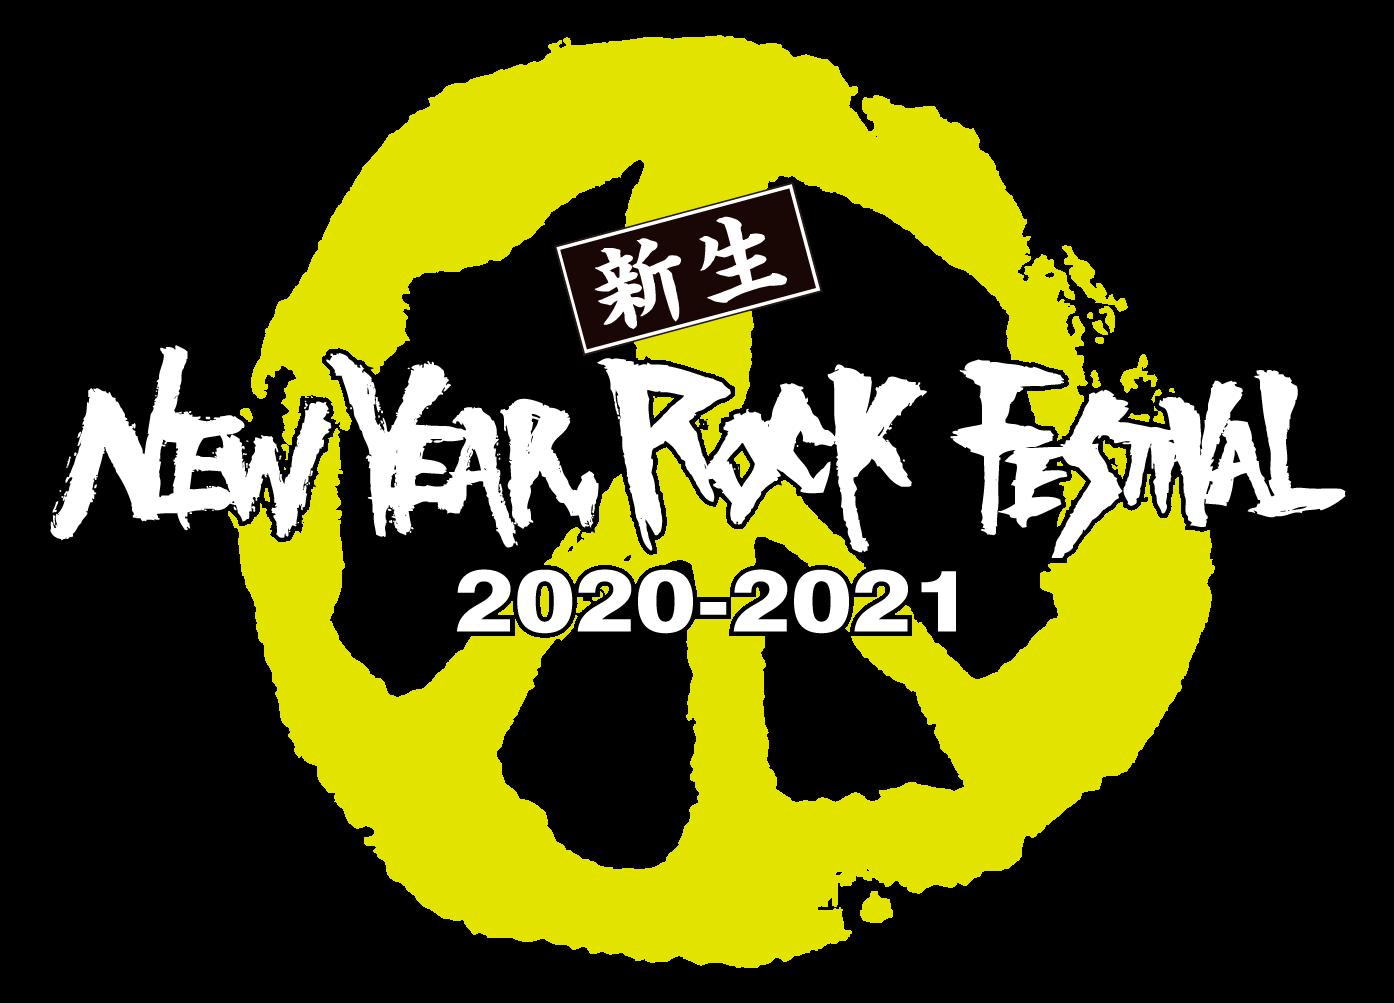 GASTUNK 無観客生配信LIVE「新生 New Year Rock Festival」出演!